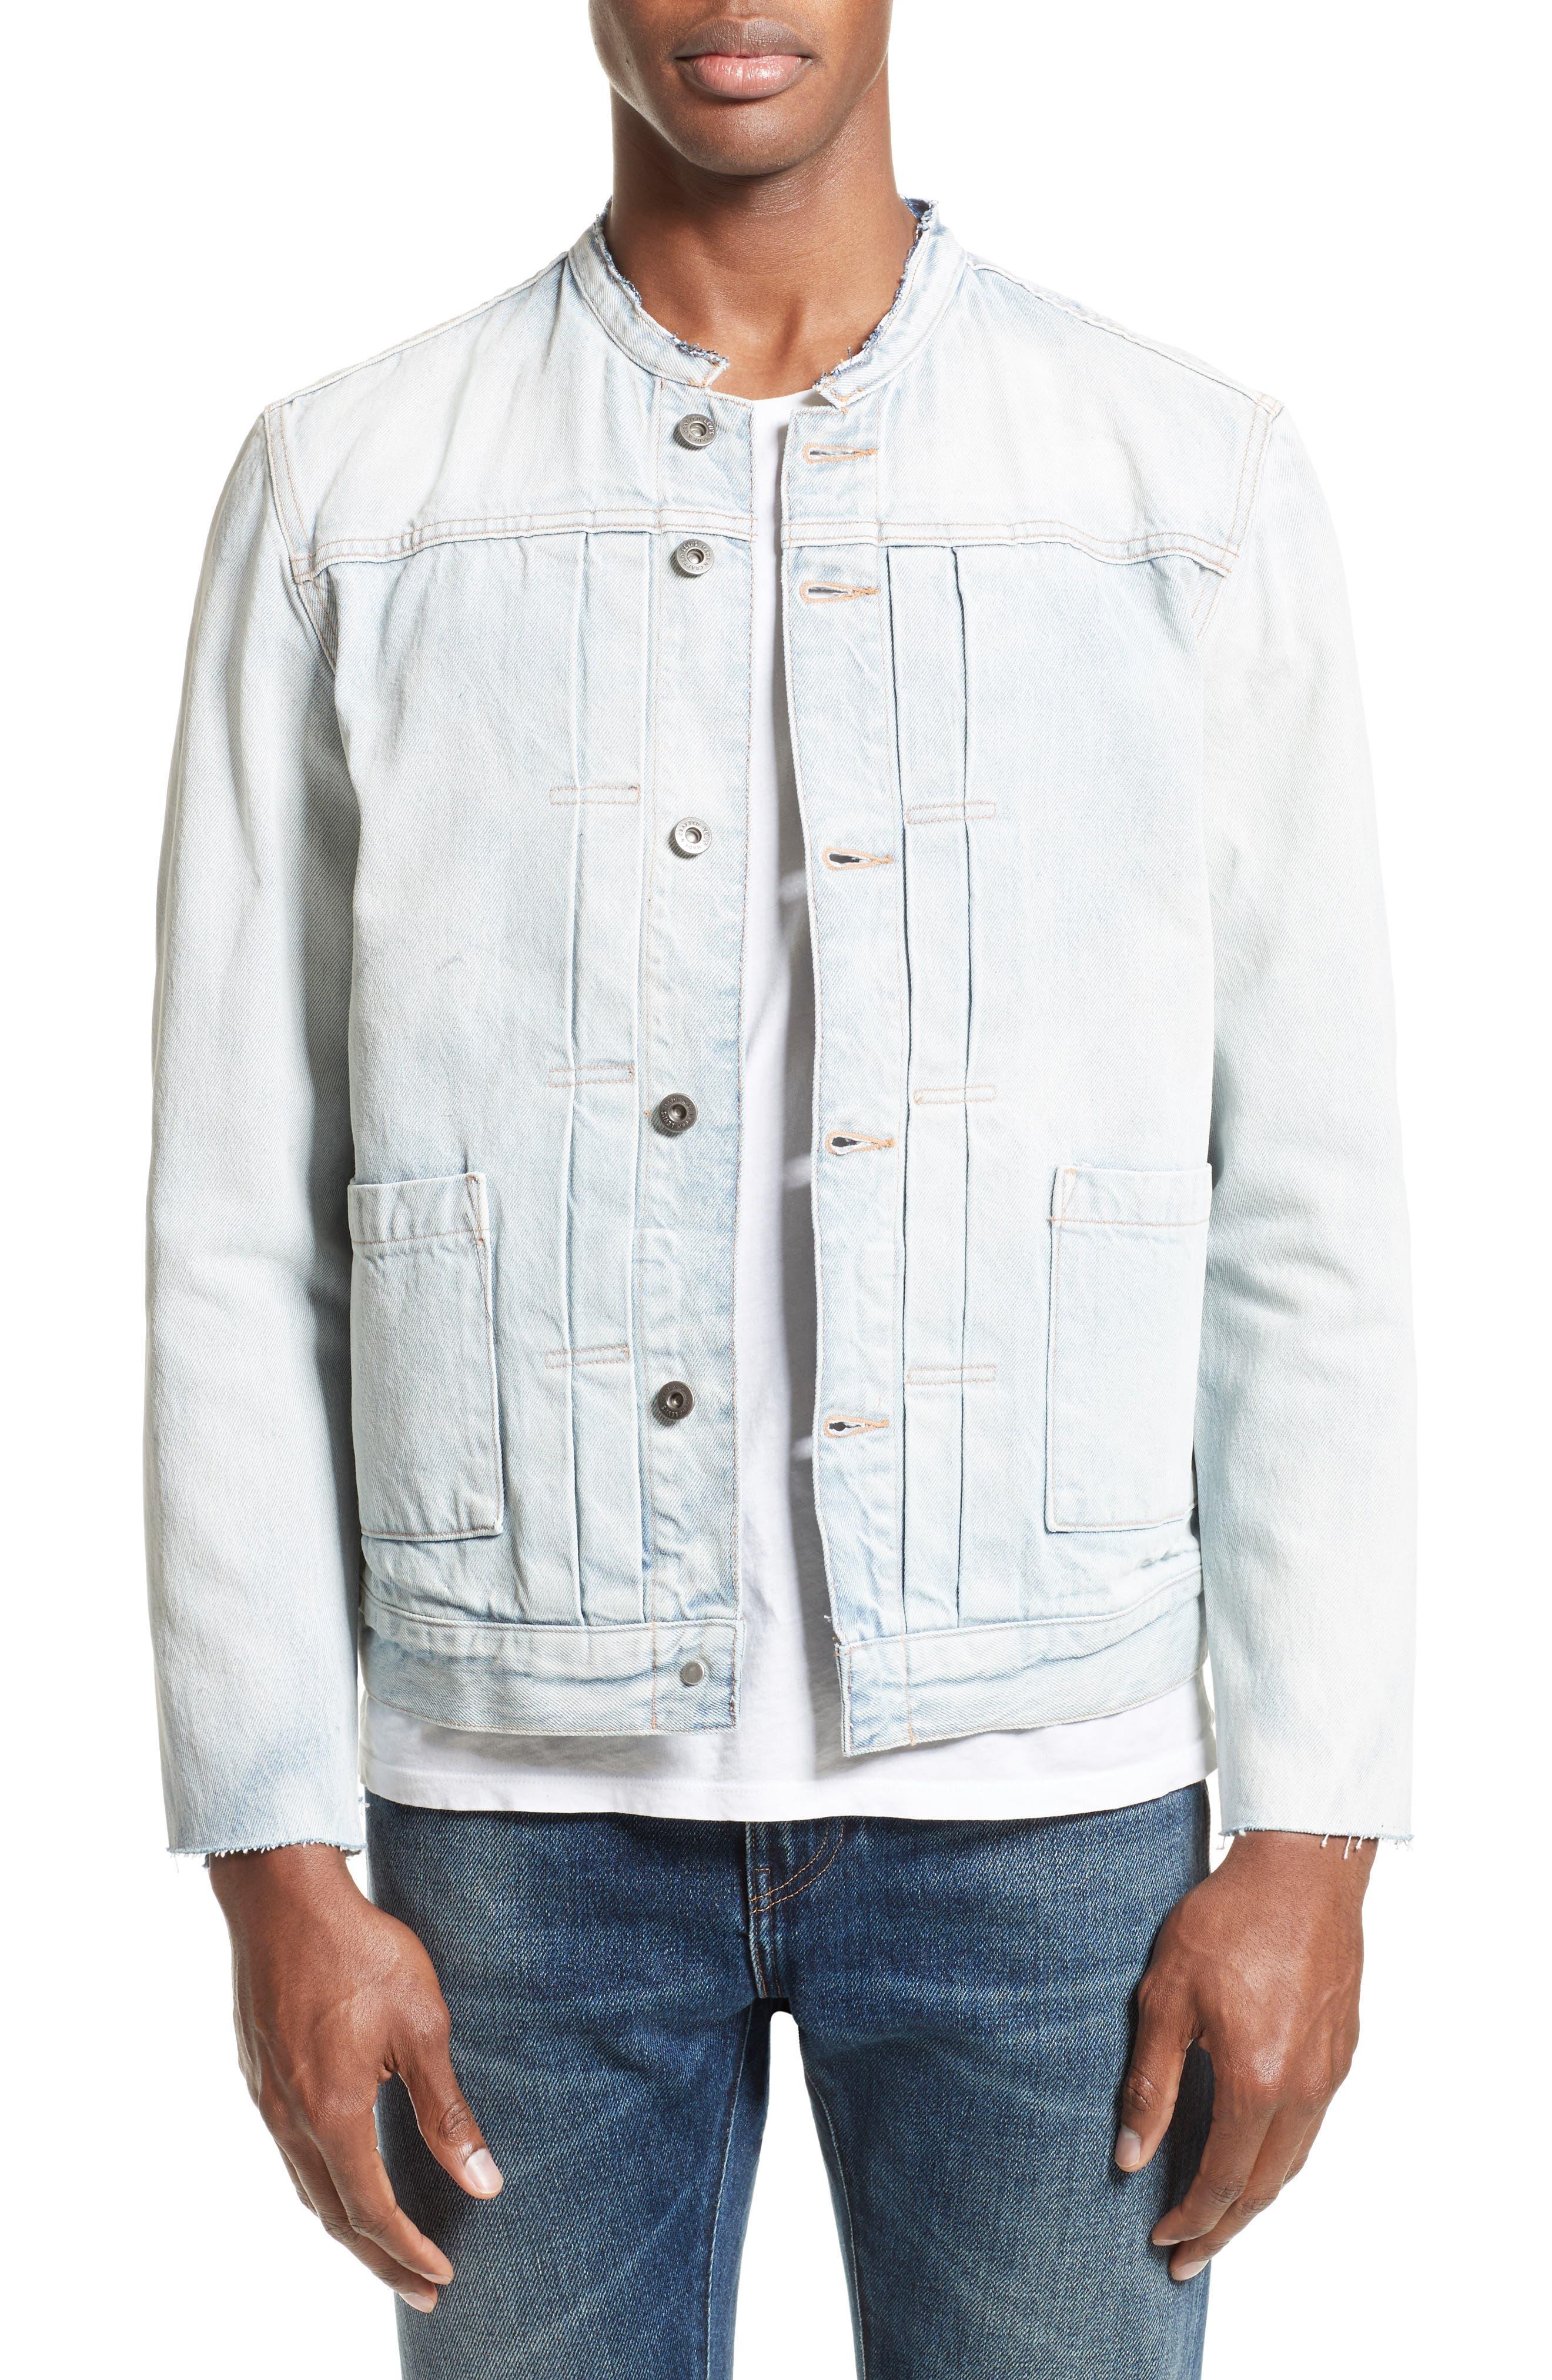 Main Image - Levi's® Made & Crafted™ Type II Trucker Raw Edge Denim Jacket